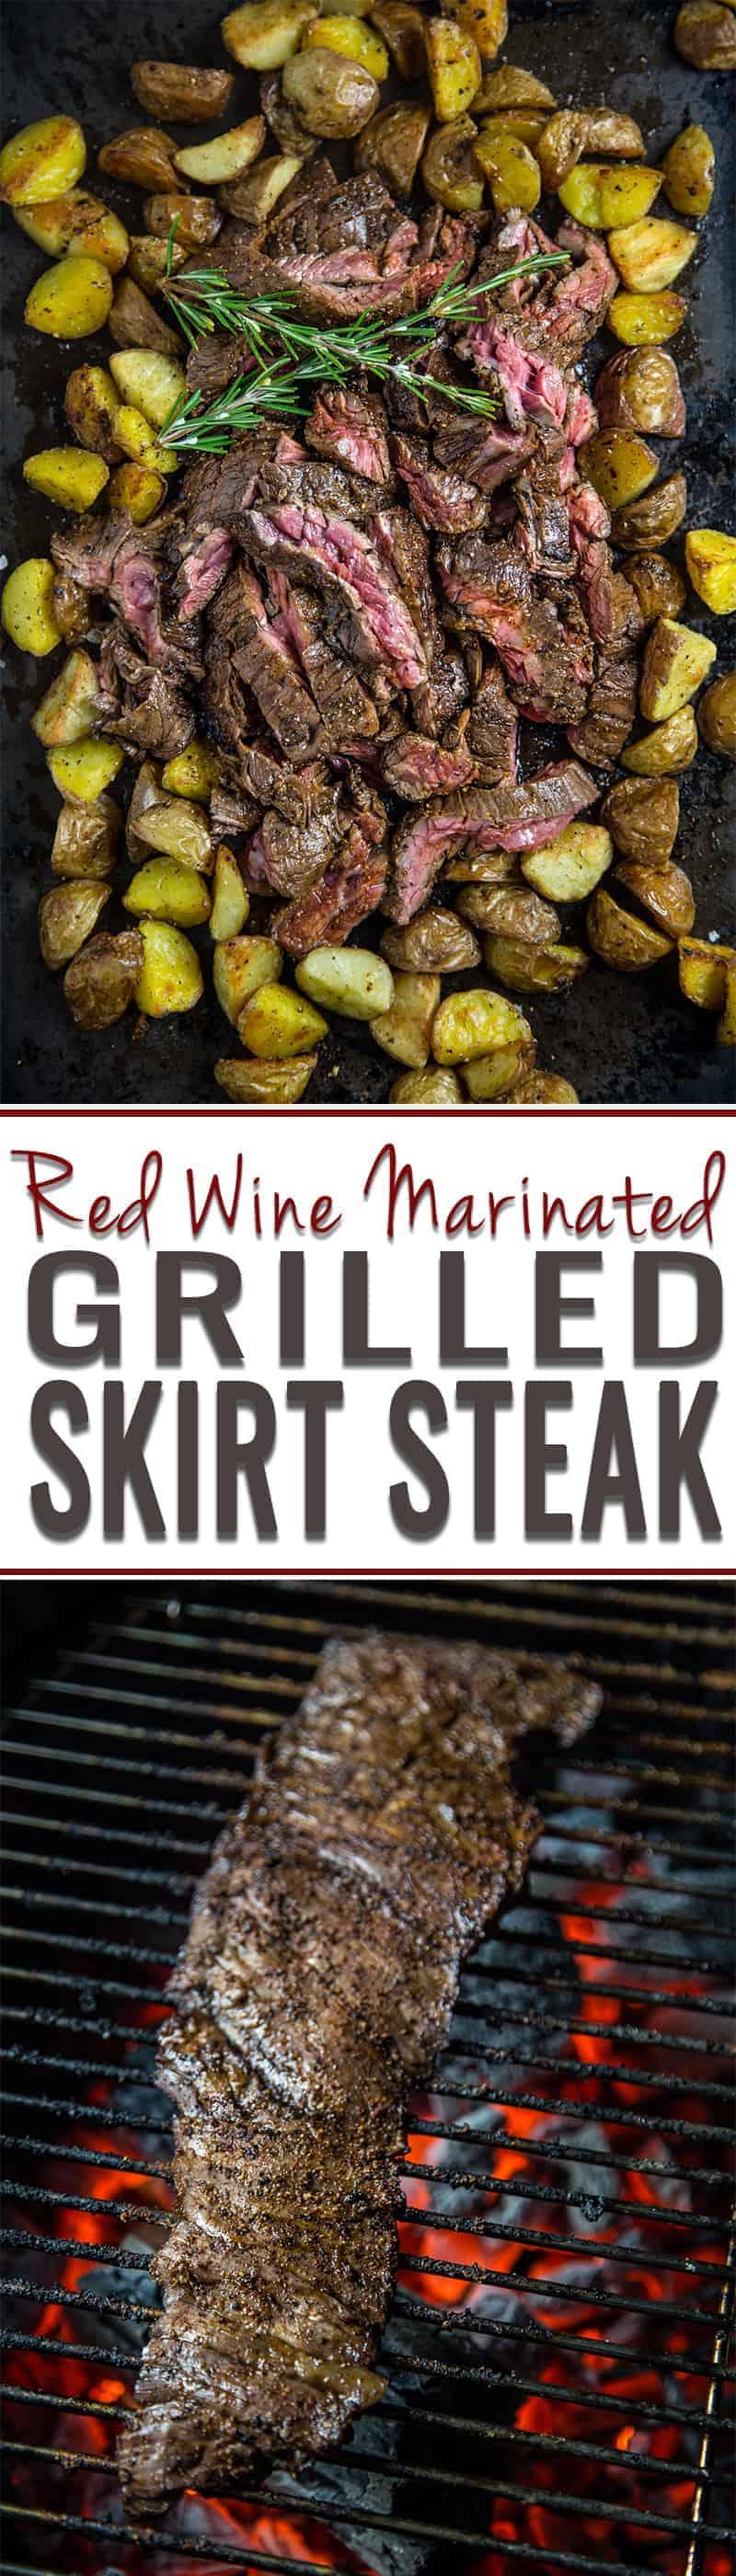 Red Wine Marinated Grilled Skirt Steak